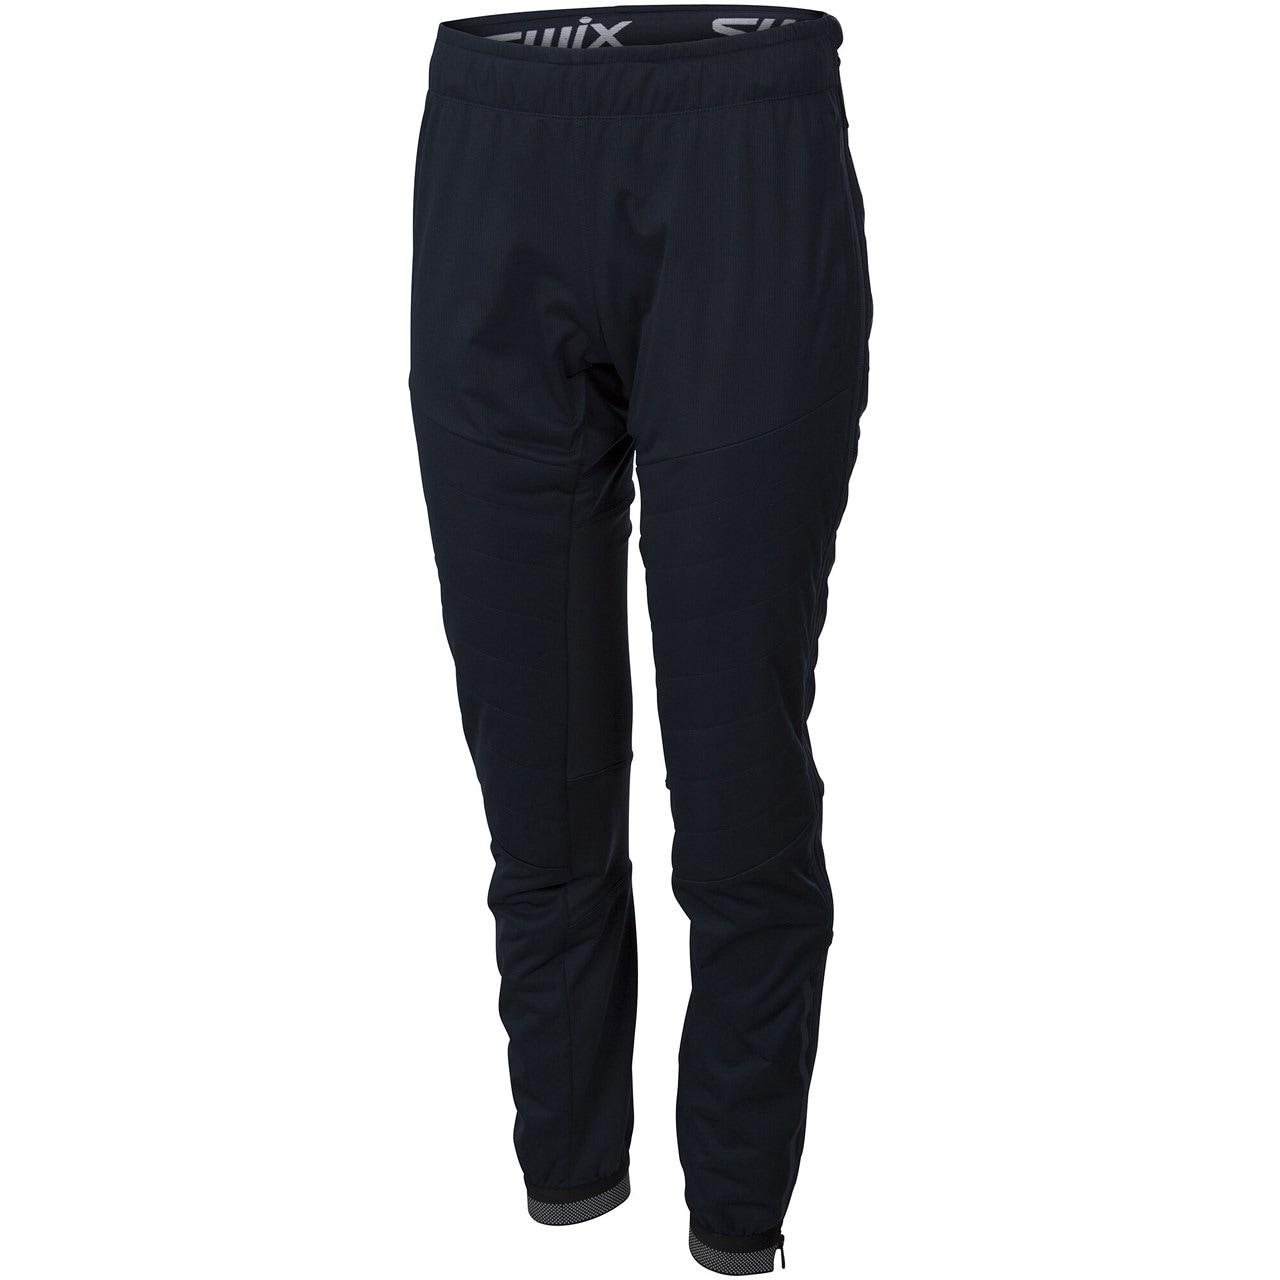 Swix Blizzard XC Pants, W's